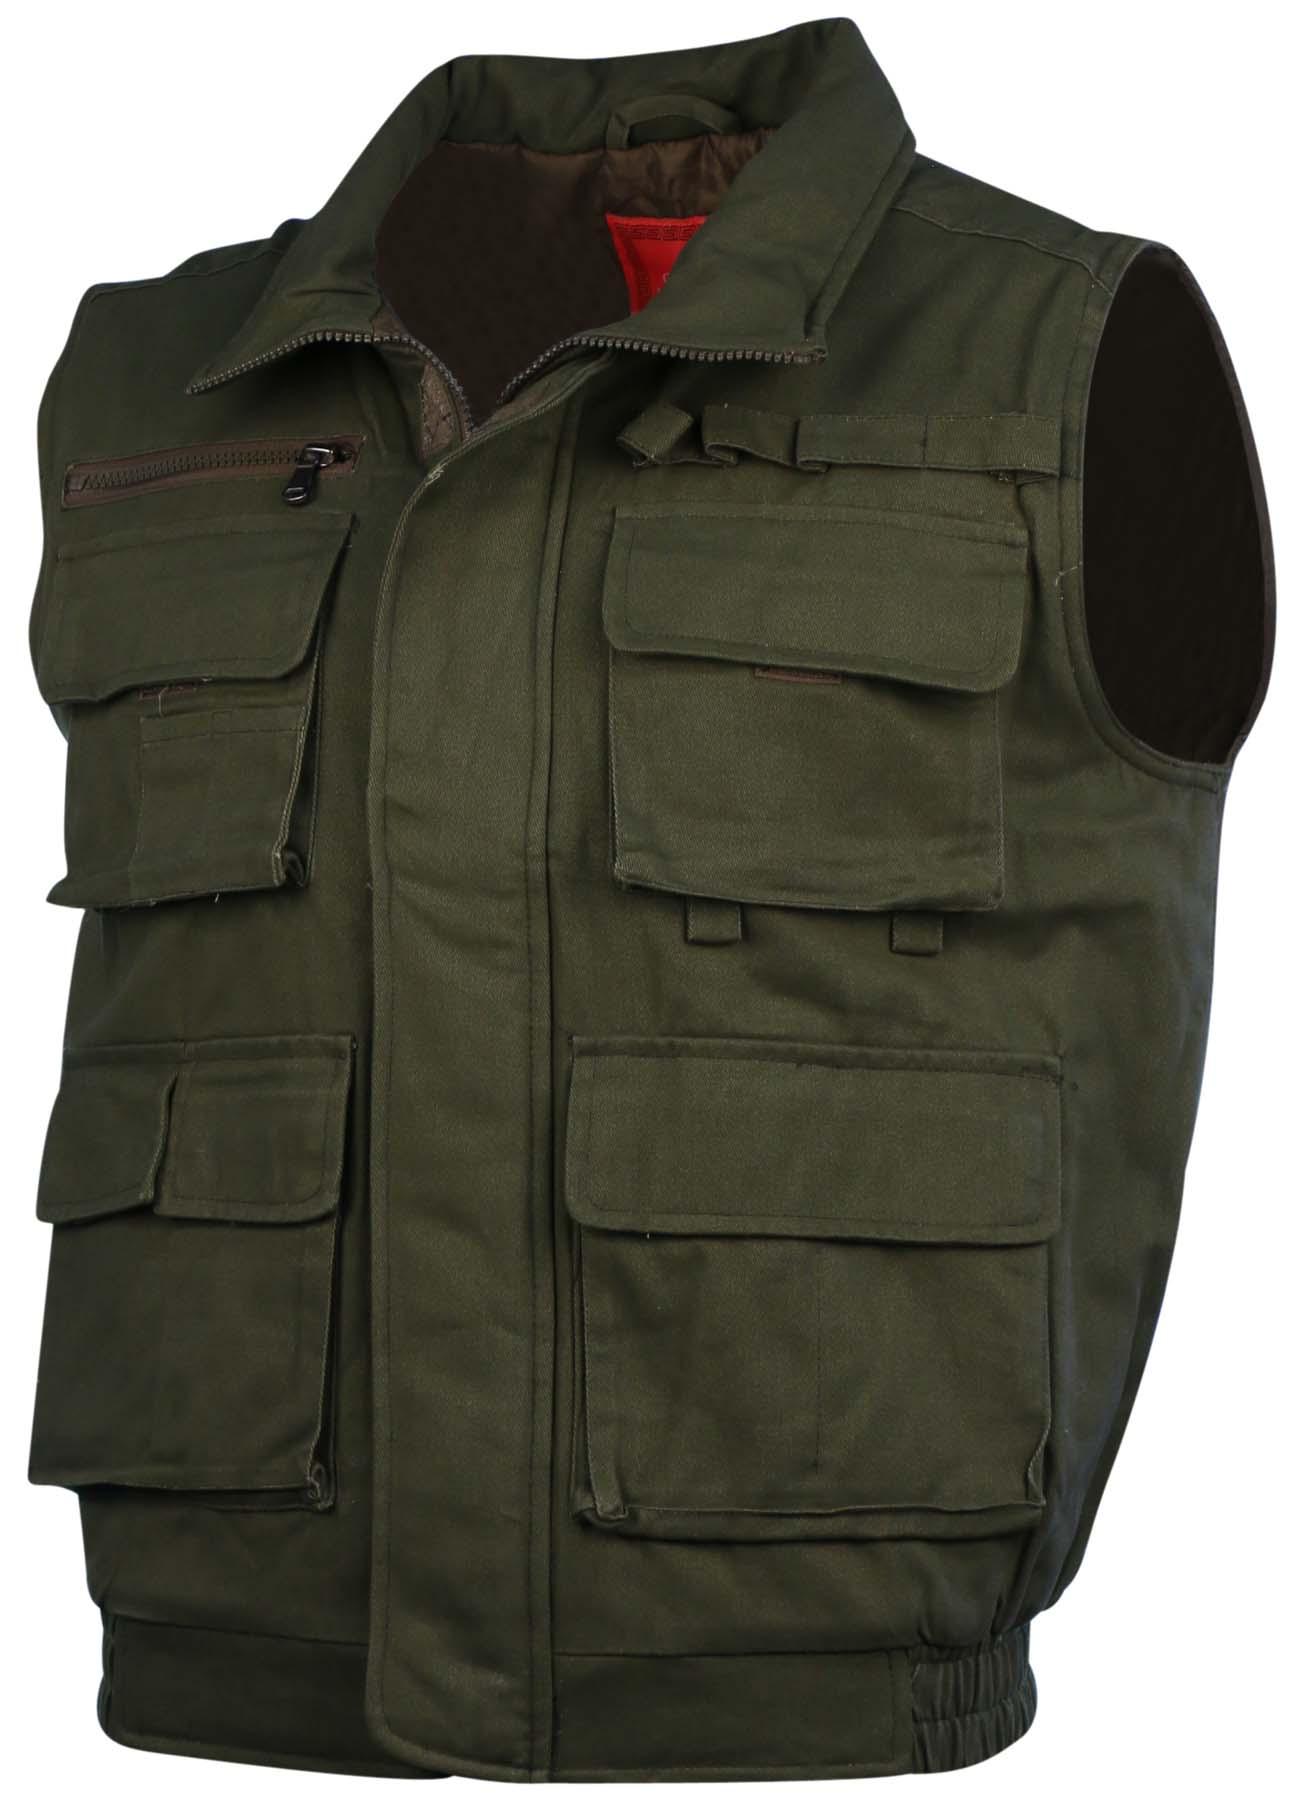 Maximos men 39 s 5 pocket fishing hunting outdoor sport vest for Mens fishing vest